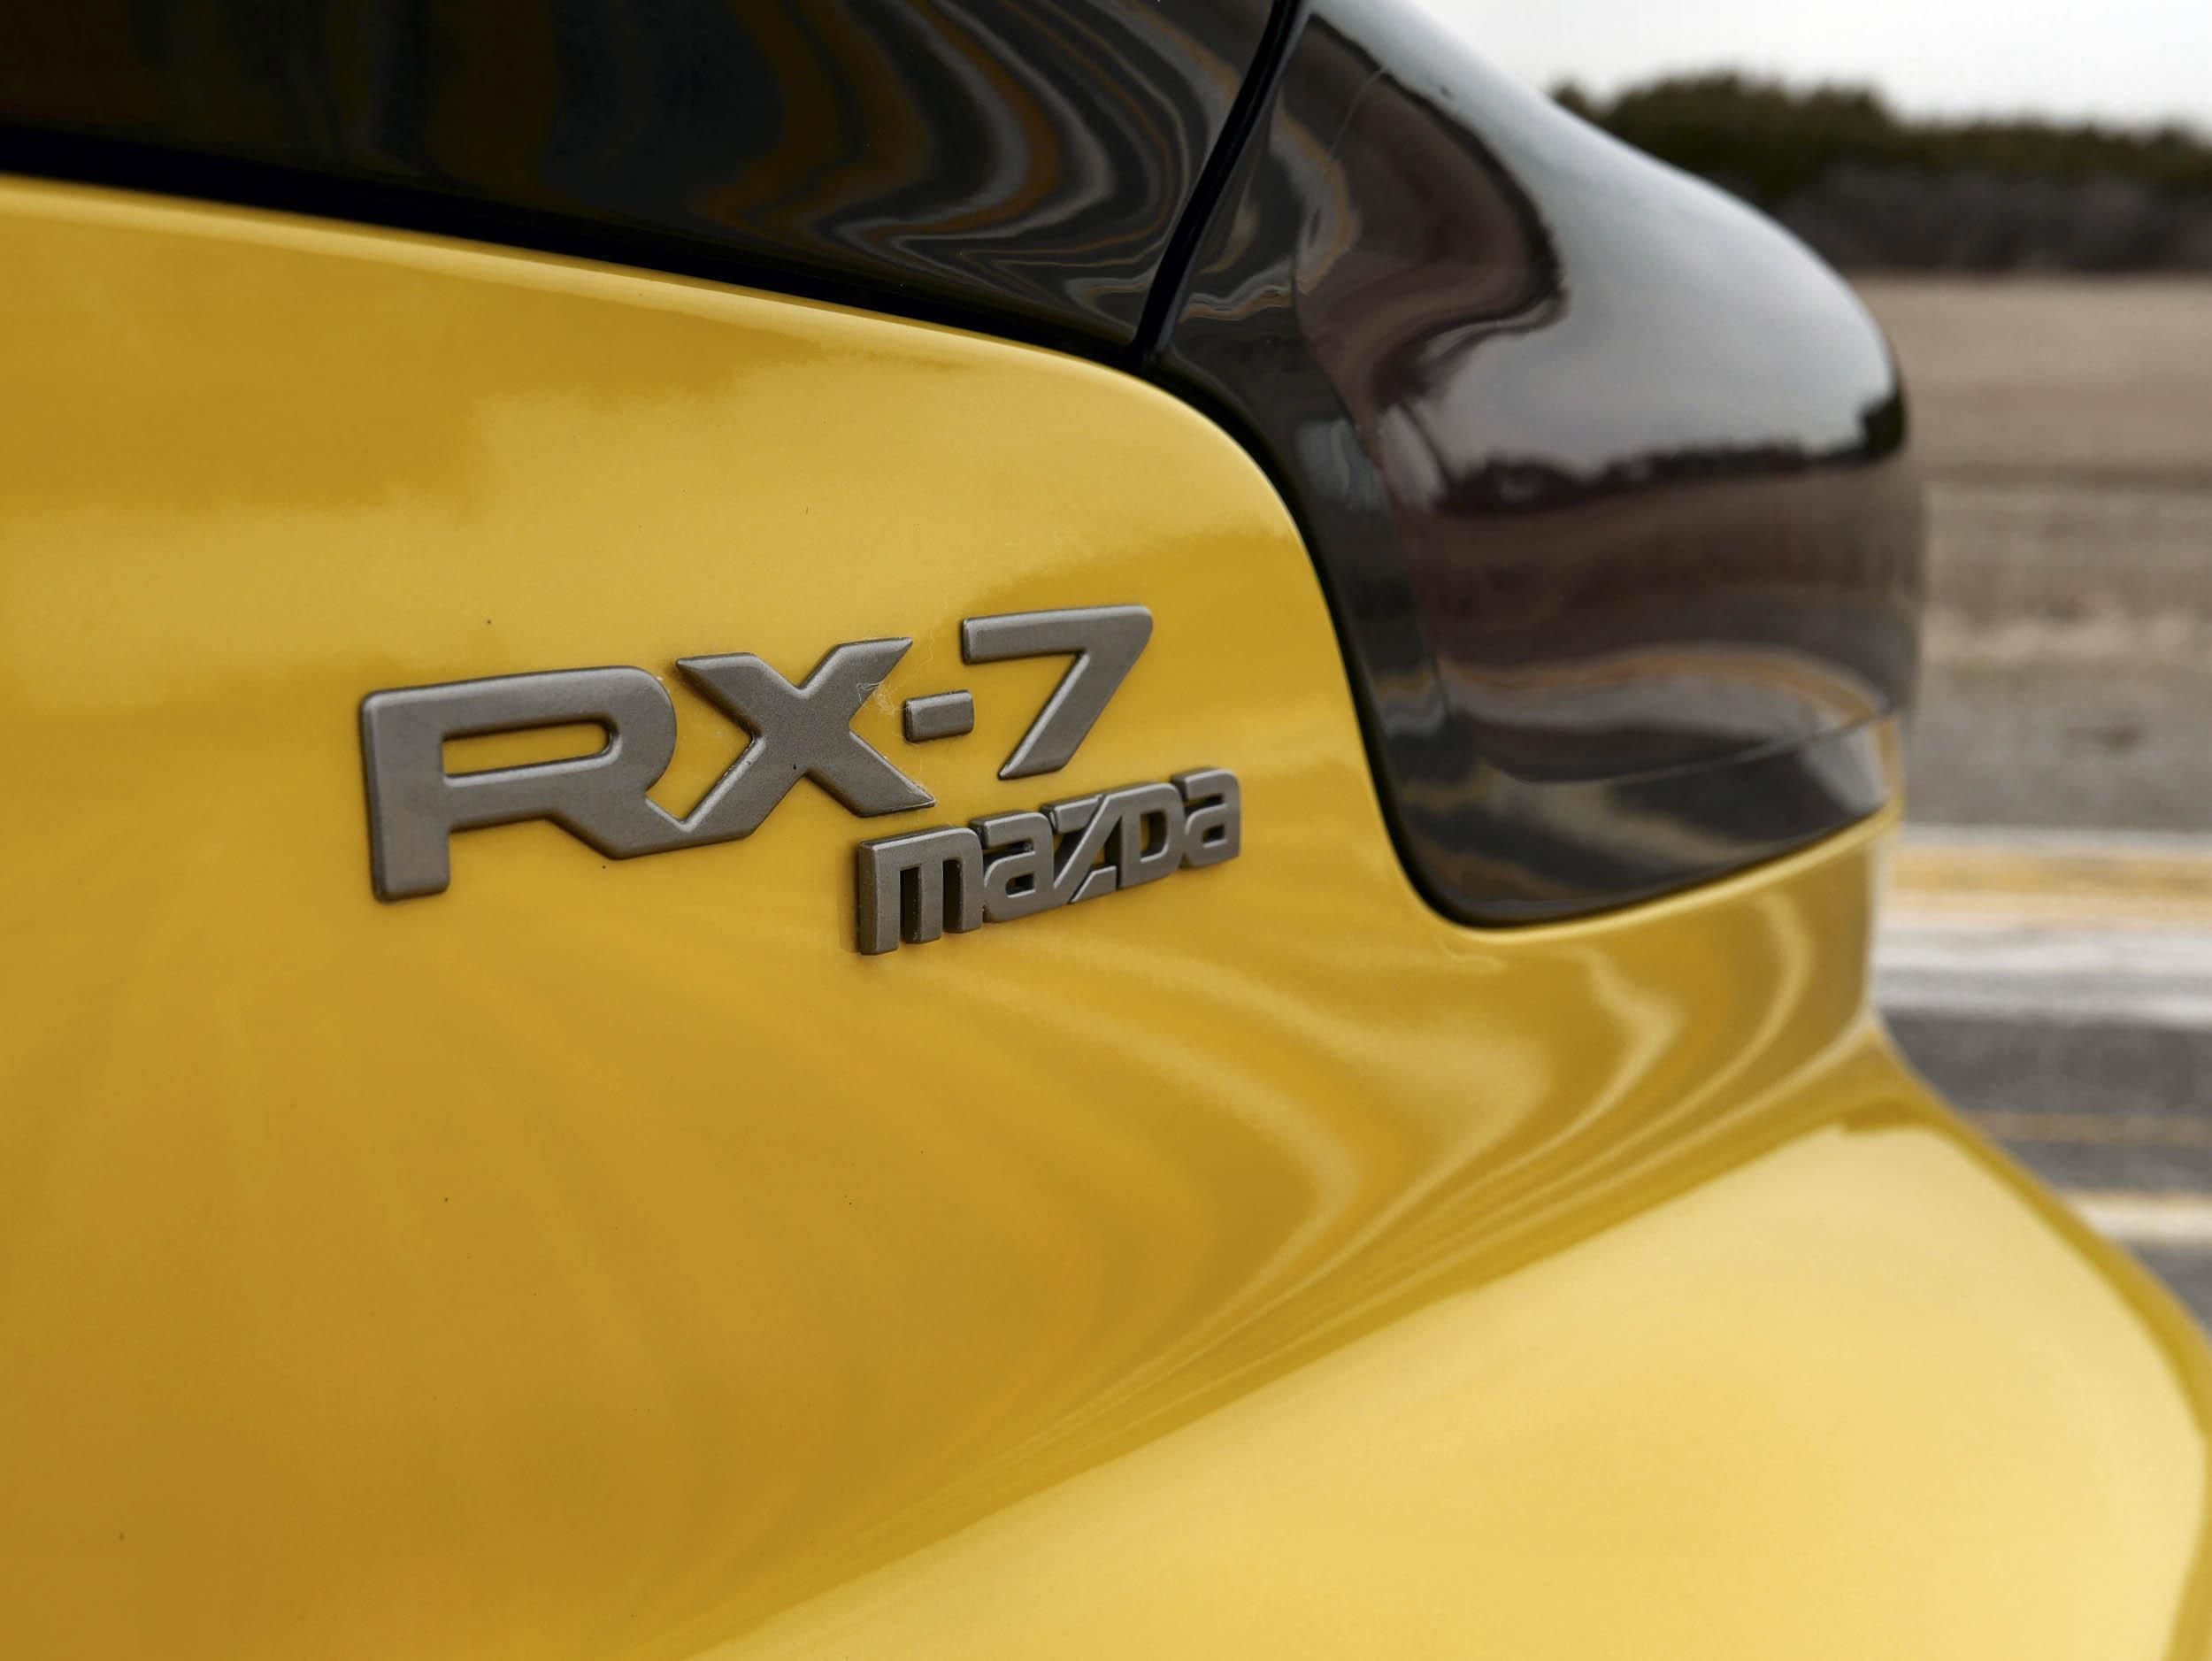 Mazda RX-7 rear trunk badge